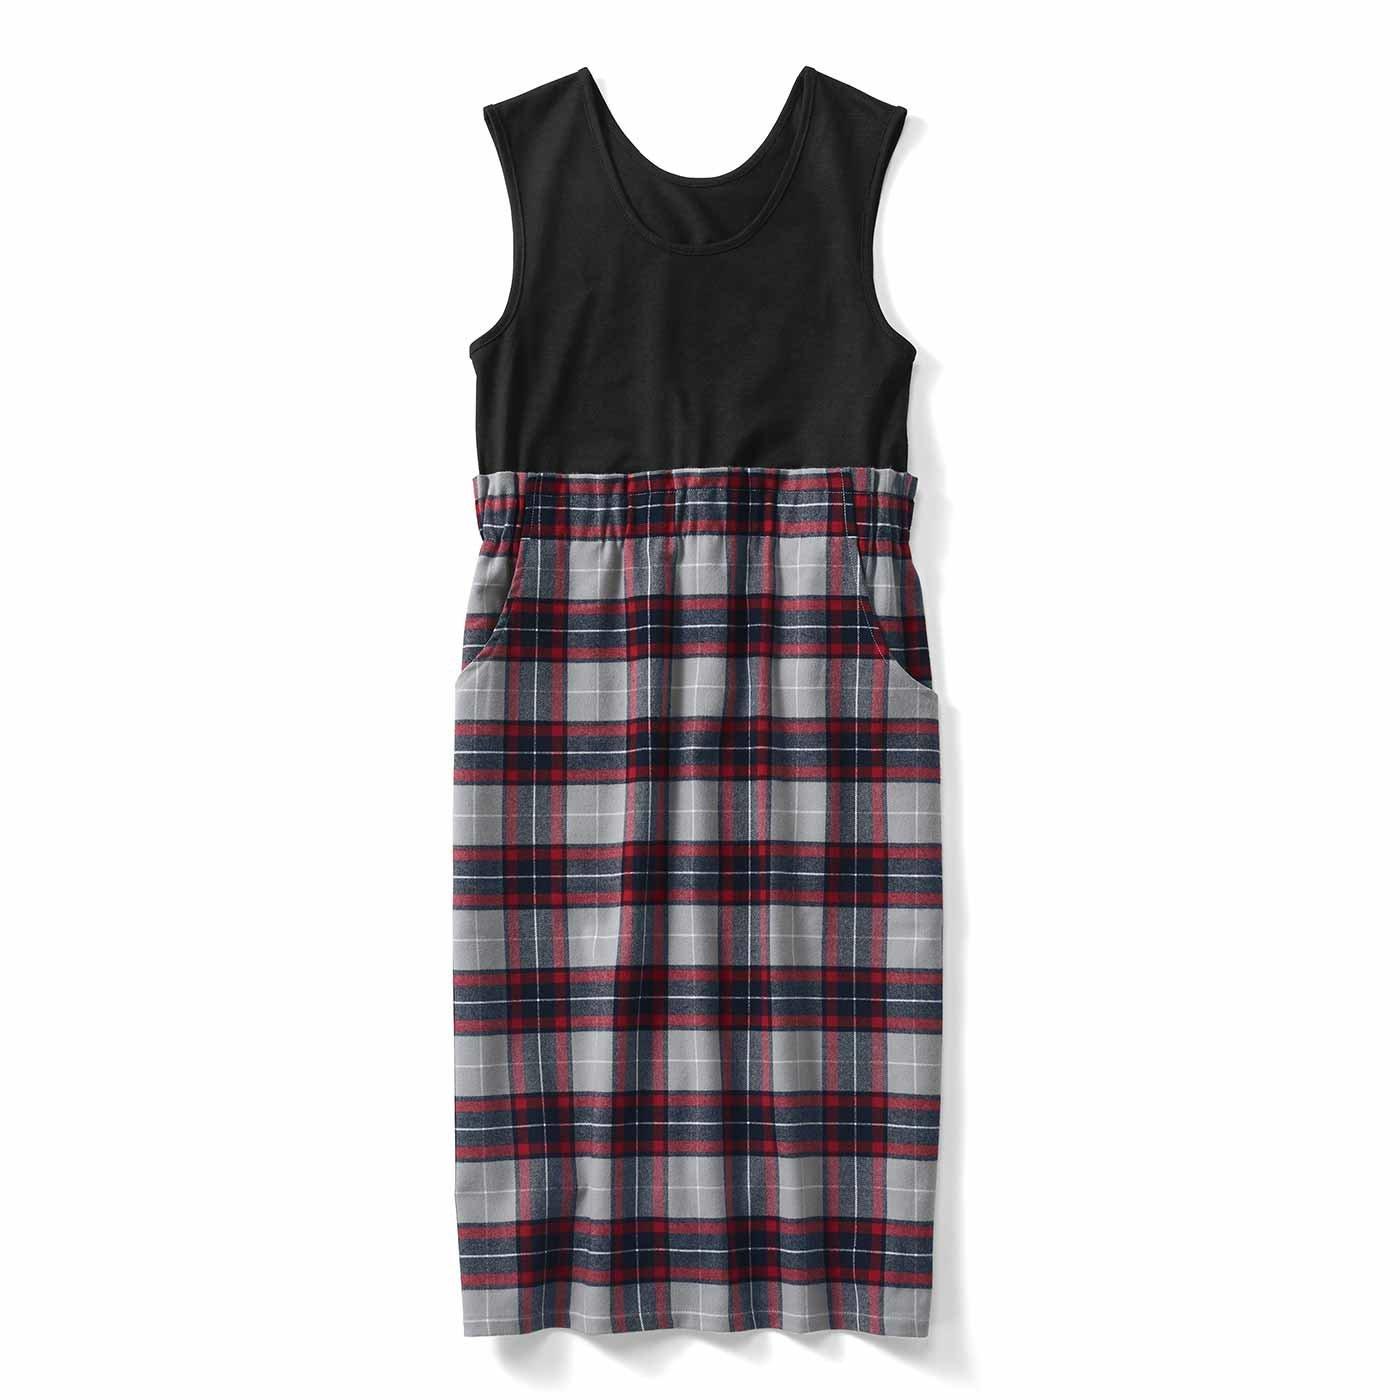 IEDIT[イディット] 上から吊ってるみたいでウエスト快適 タンクトップ付き 着映えチェック柄のⅠラインスカート〈グレー〉